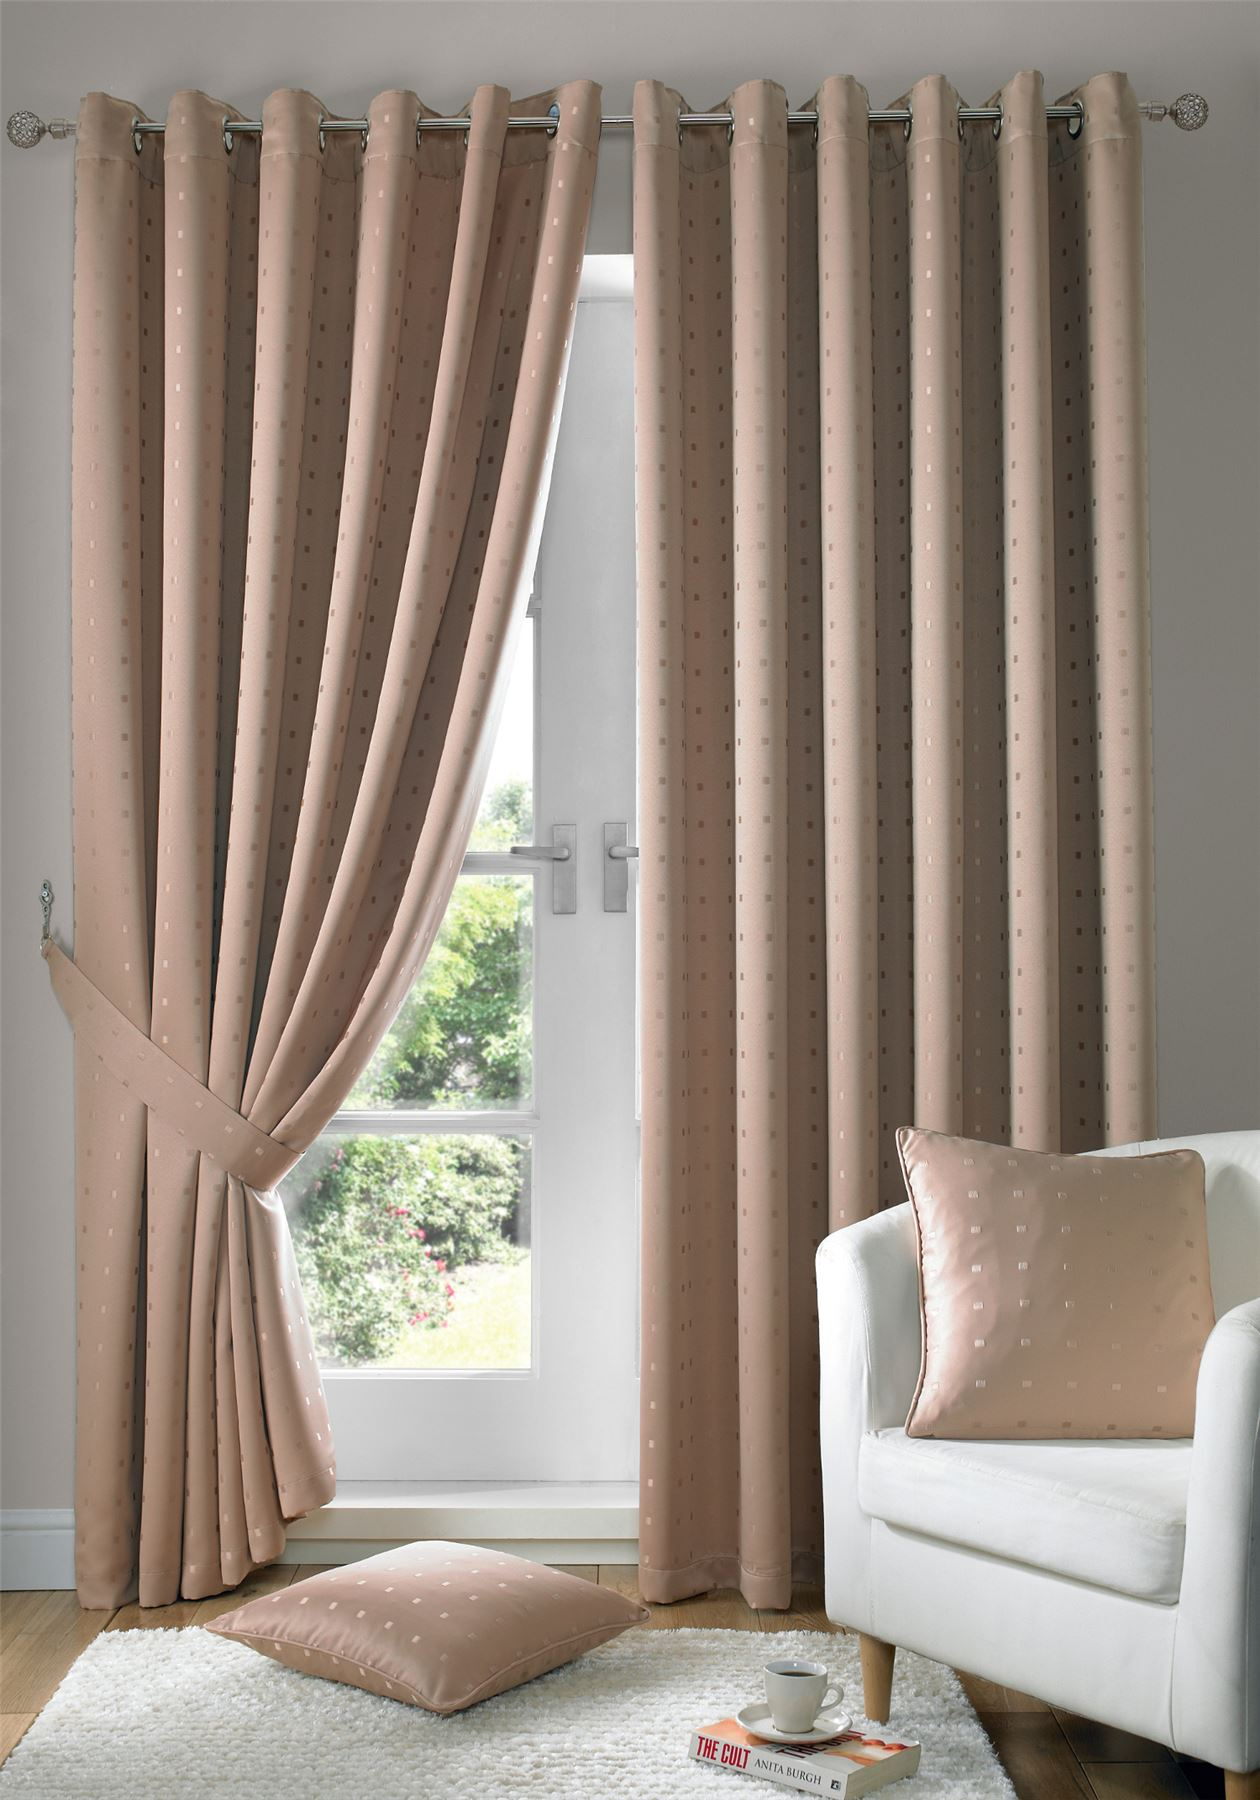 jacquard check latte beige lined ring top eyelet curtains drapes 6 sizes ebay. Black Bedroom Furniture Sets. Home Design Ideas